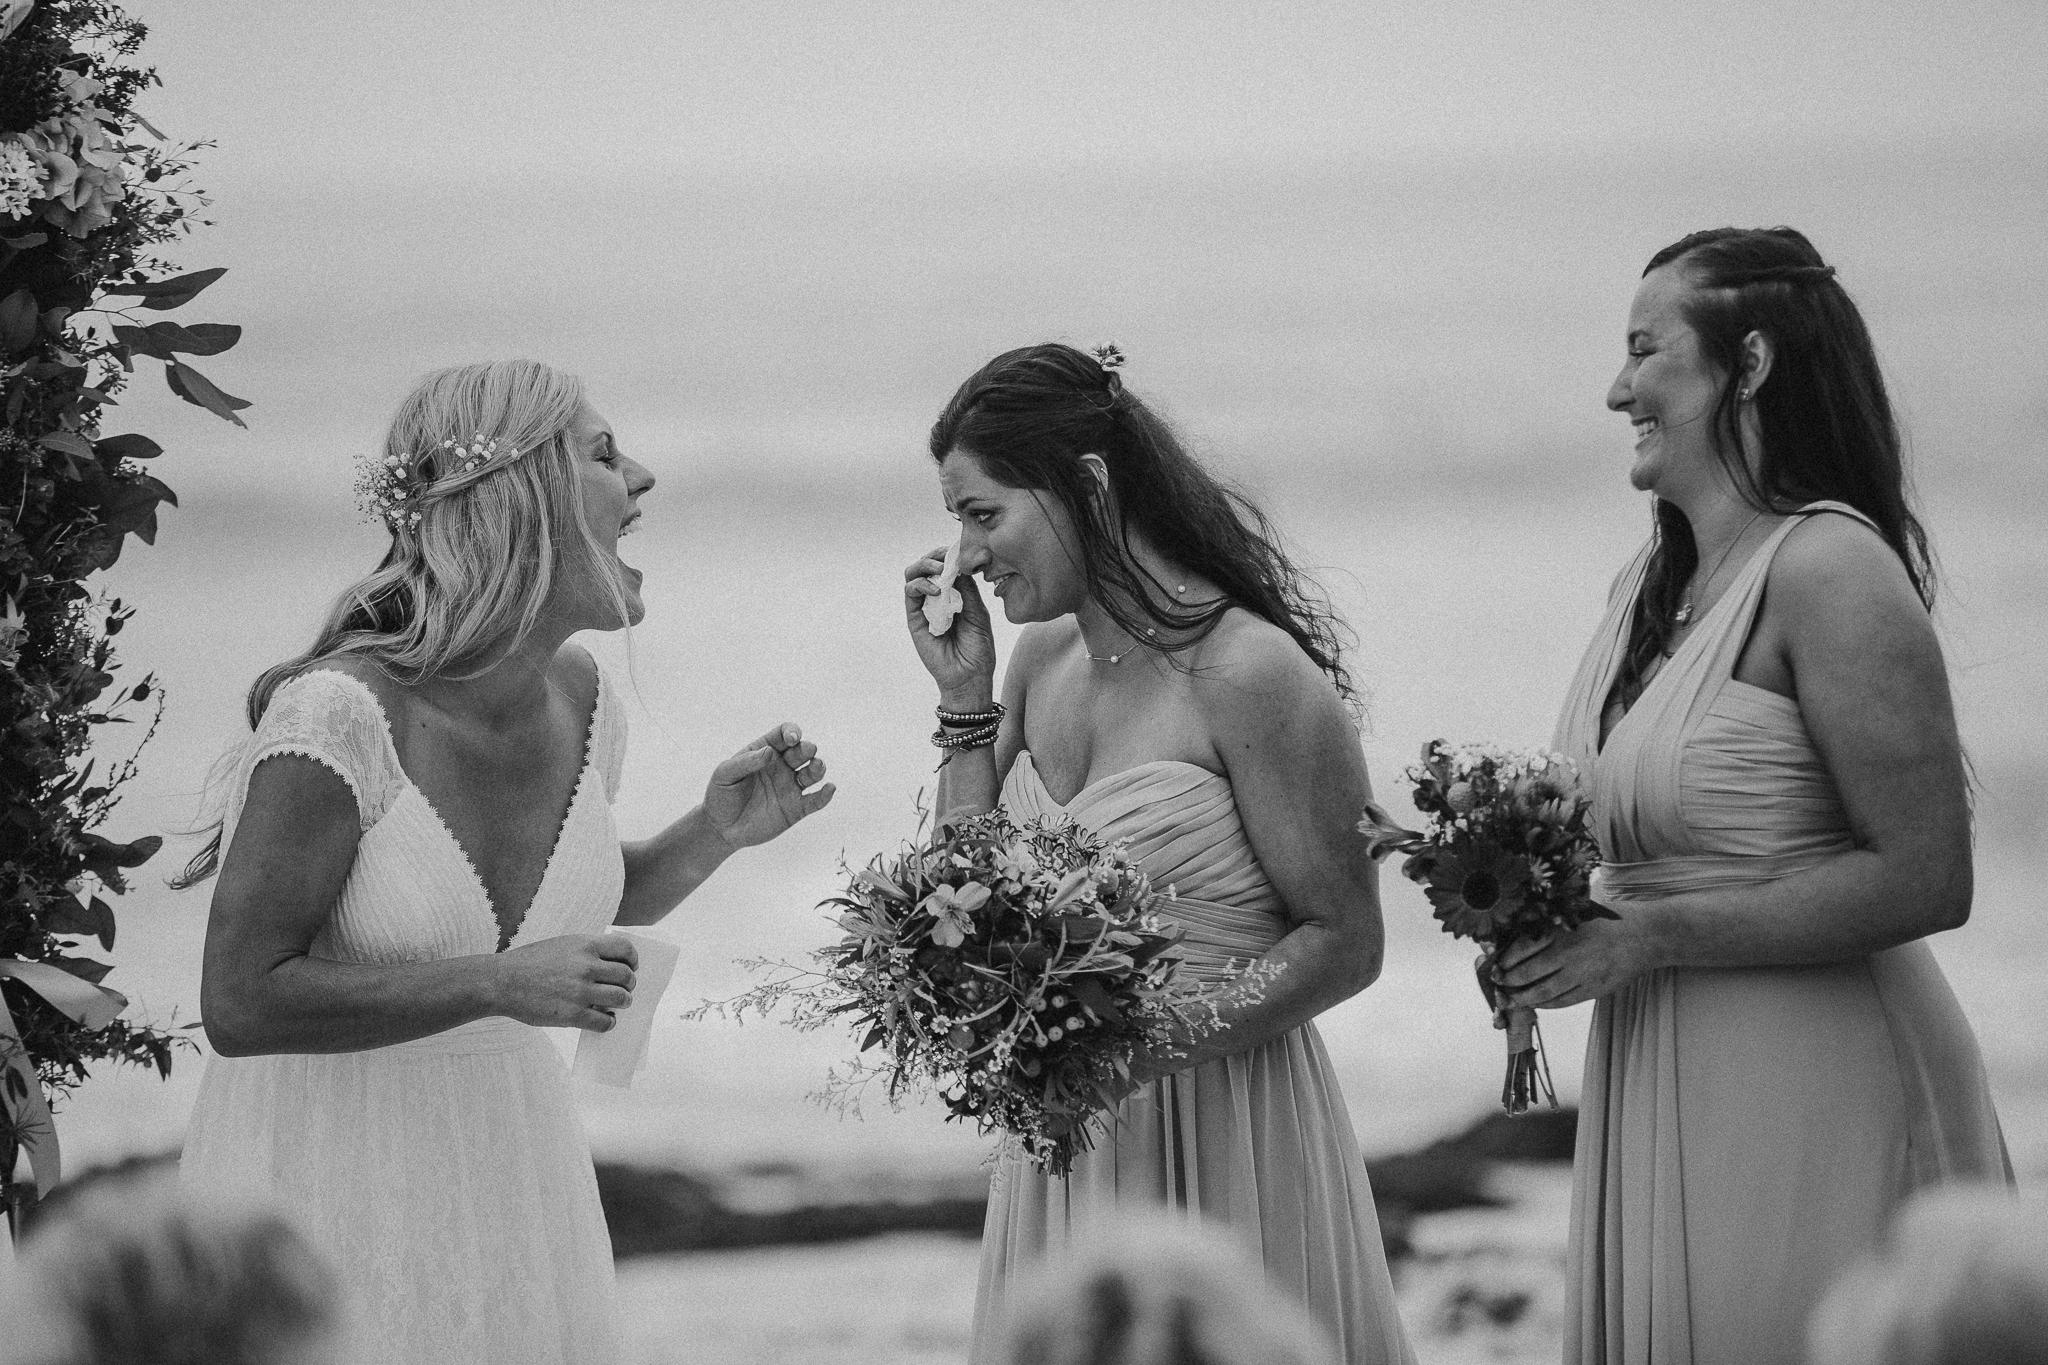 Archer_Inspired_Photography_Pacific_Grove_Ansilomar_Beach_Carmel_Valley_Wedding-96.jpg